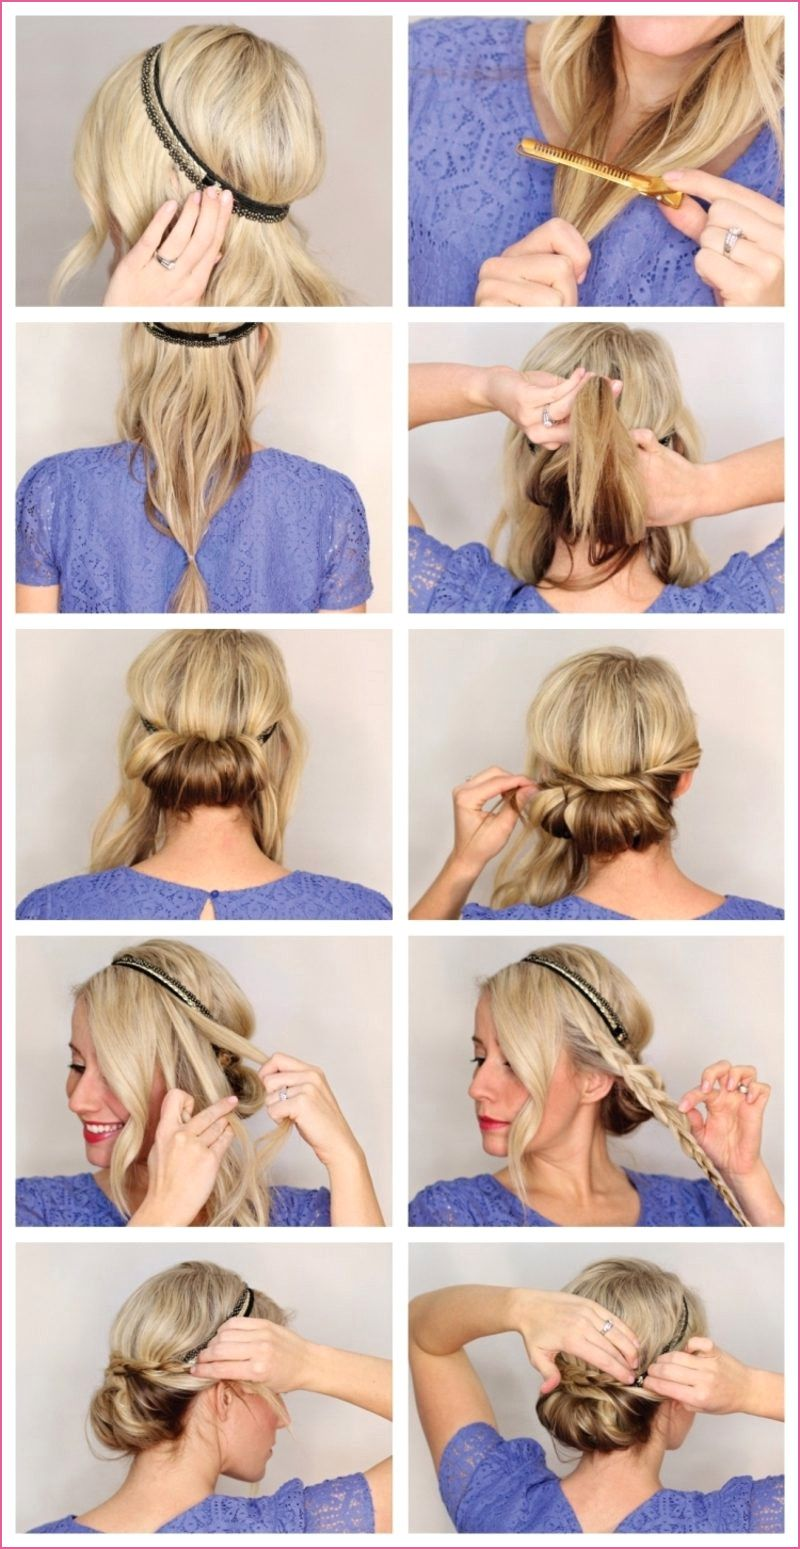 Duttkissen Selber Machen Haarband Frisur Anleitung Haarband Frisur Mittellange Haare Frisuren Einfach